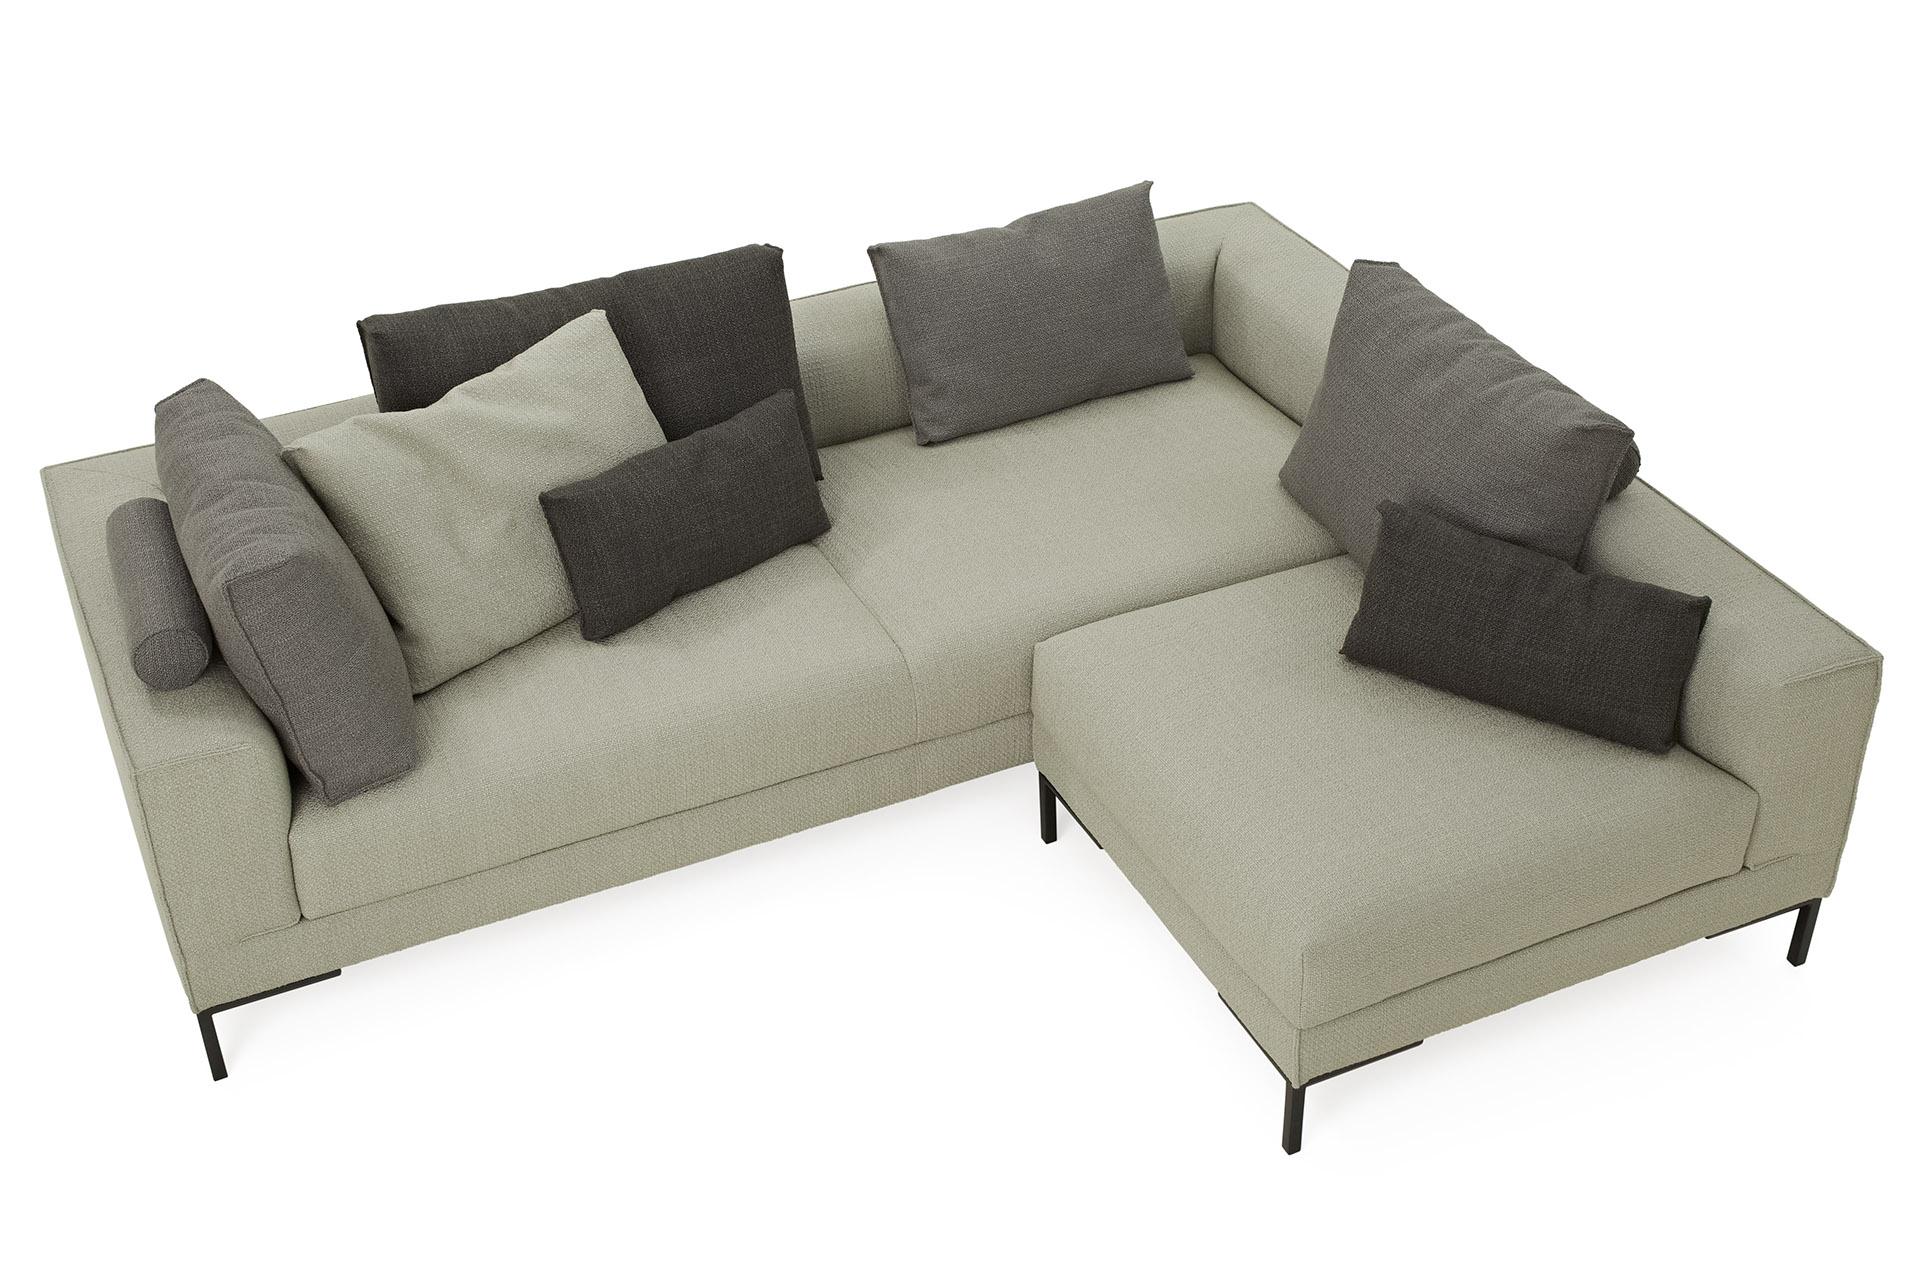 Aikon Lounge van DesignonStock